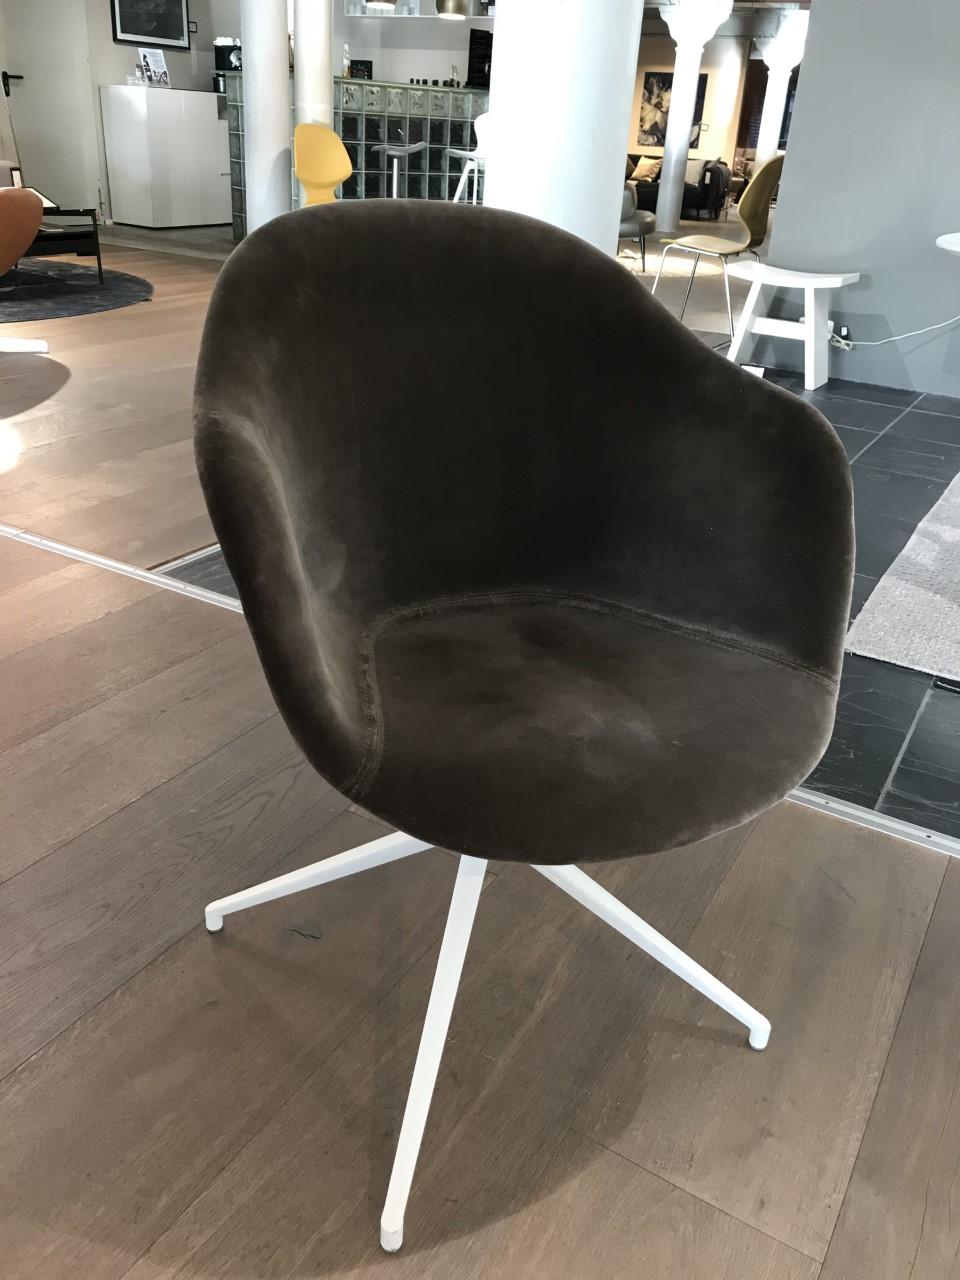 Adelaide Stuhl mit Drehfunktion 5x verfügbar preis pro stuhl